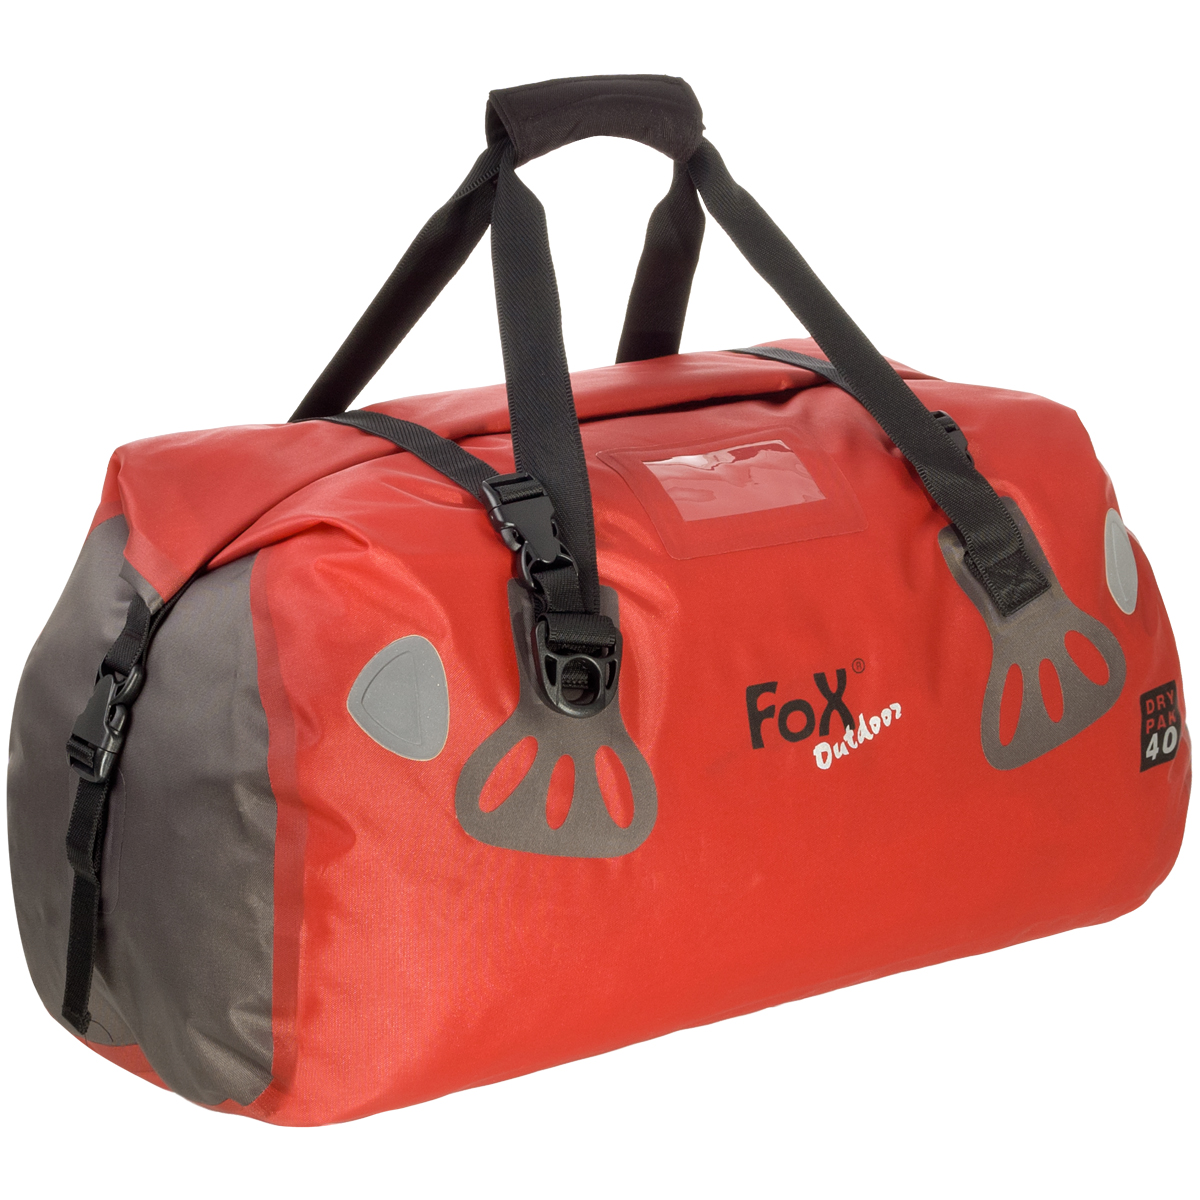 Waterproof Duffle Bags >> Details About Fox Outdoor Waterproof Duffle Bag Dry Pak 40 Kayak Boat Sailing Roll Pack Red